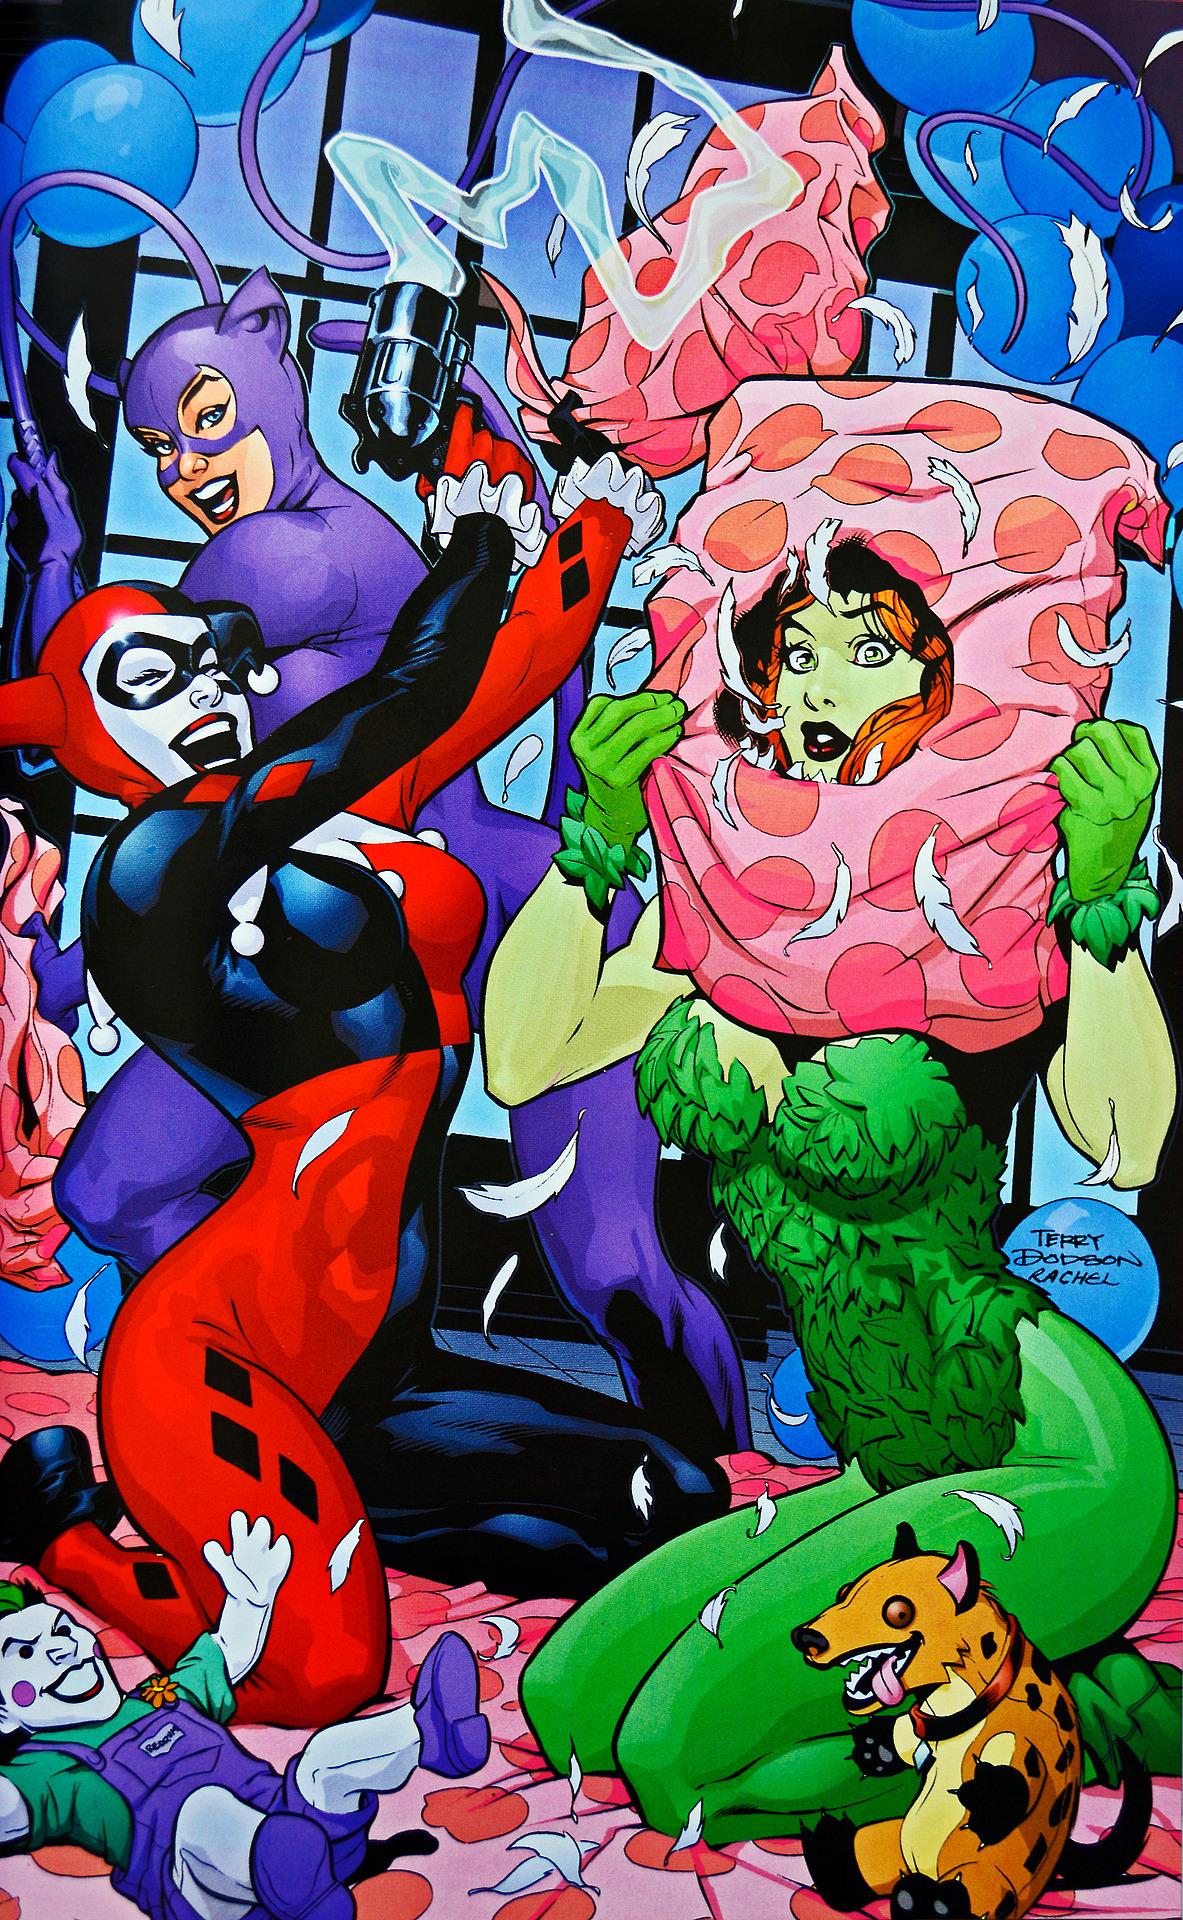 Harley Quinn Vol 1 3 Textless.jpg